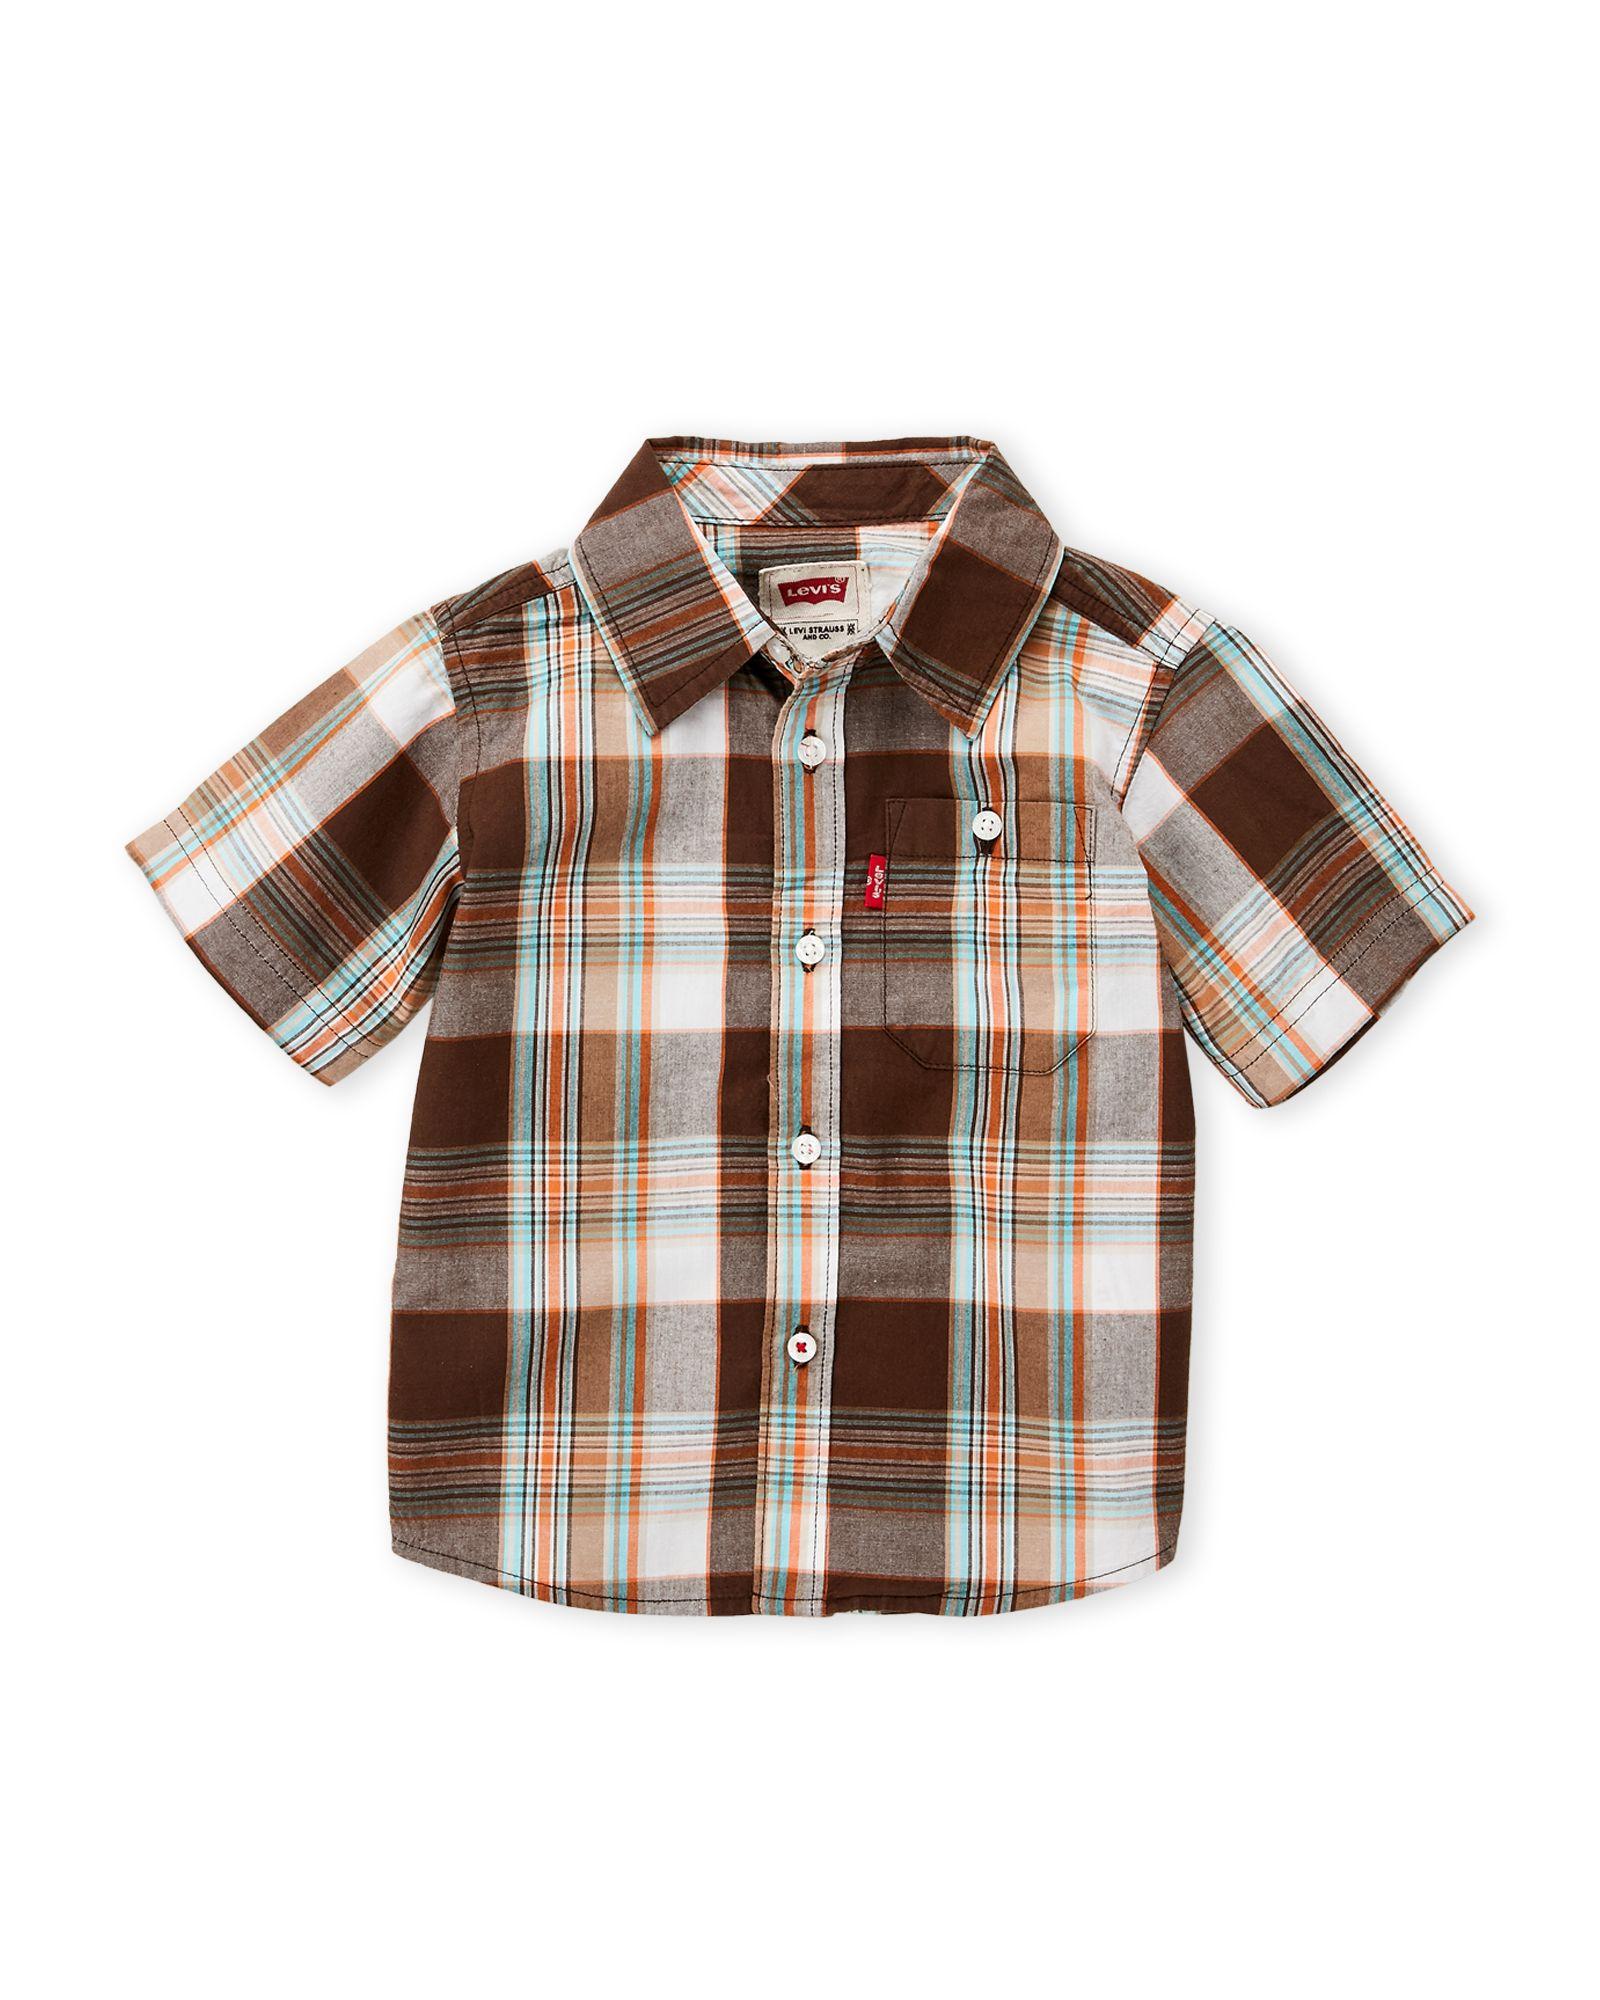 Flannel shirt knot  Levius Toddler Boys Plaid Short Sleeve ButtonDown  Apparel